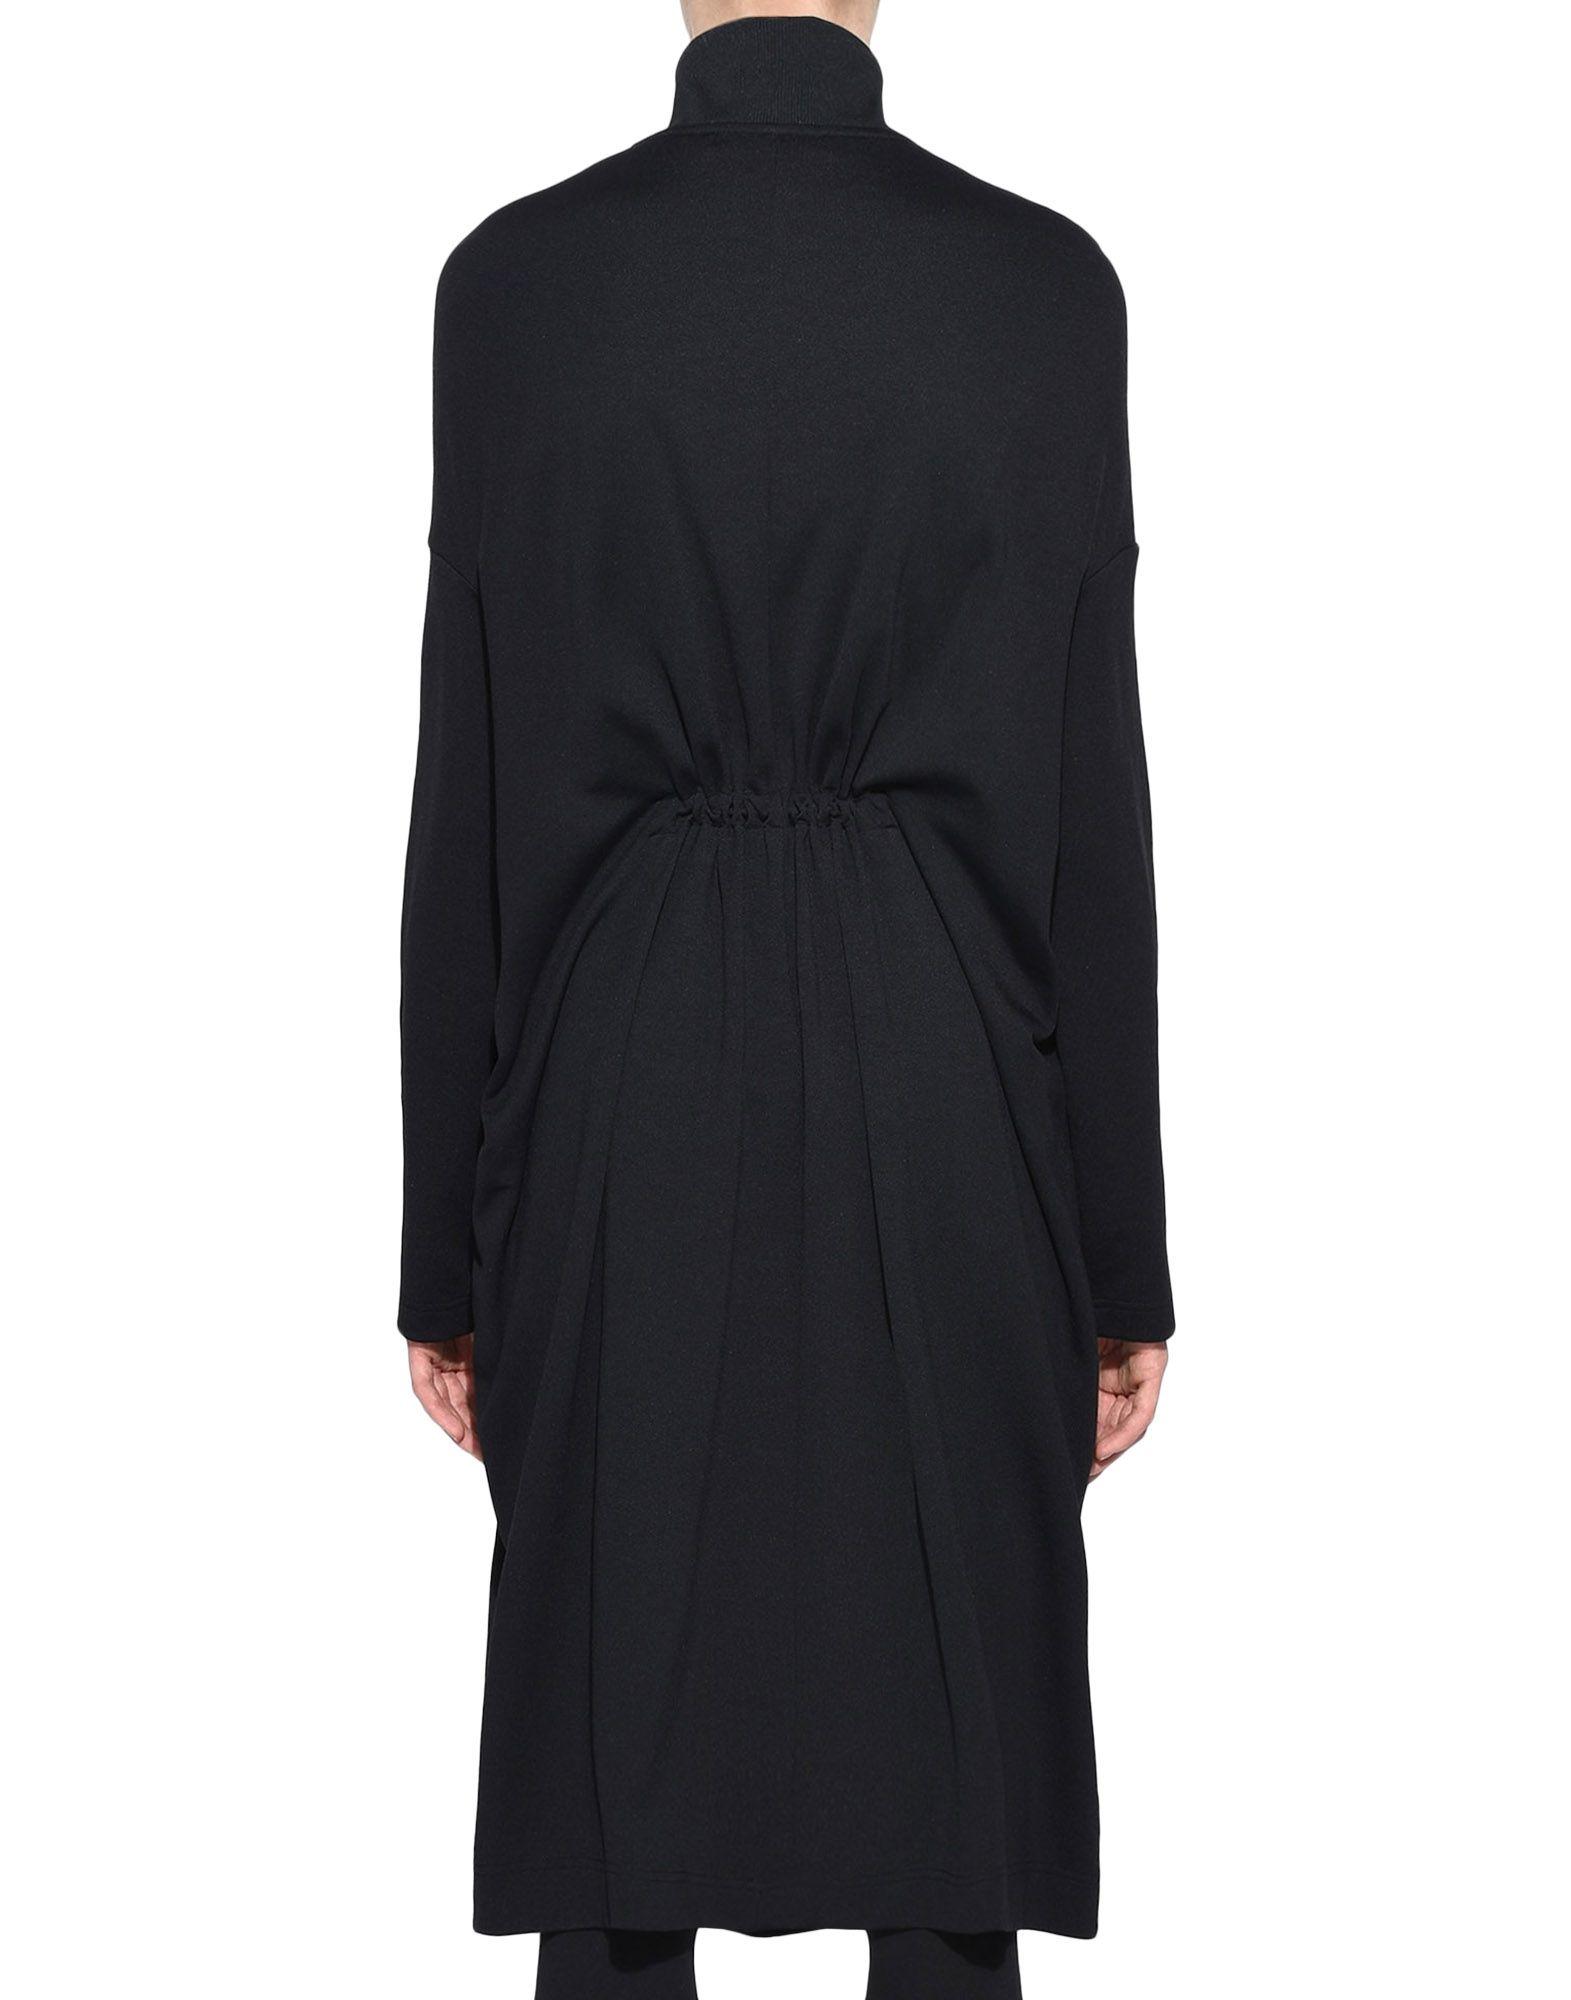 Y-3 Y-3 Matte Track Dress Vestito longuette Donna d